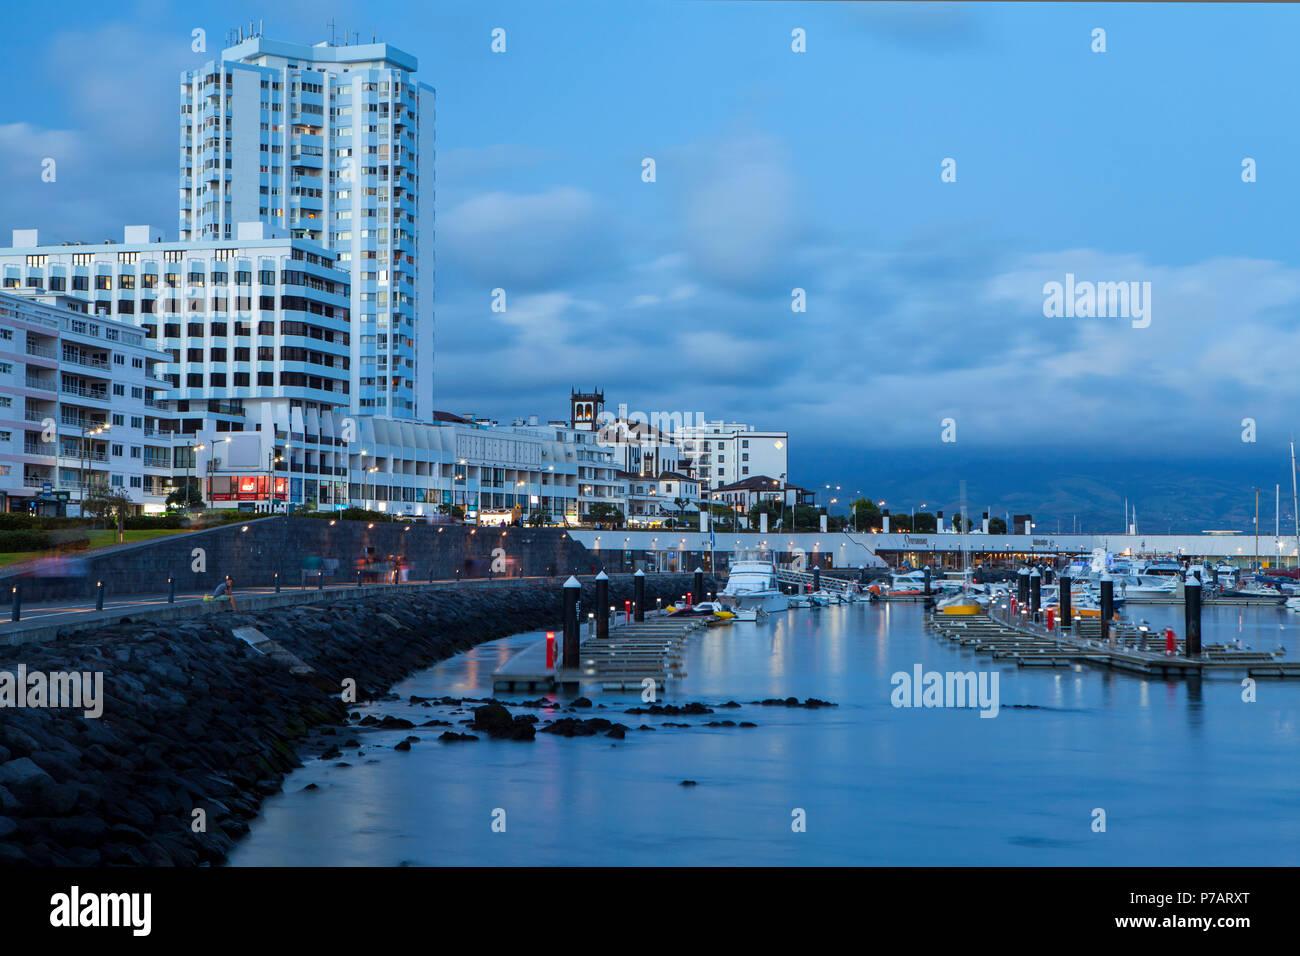 PONTA DELGADA, PORTUGAL - 28. JUNI 2018: Ponta Delgada, Sao Miguel Island, ist die Hauptstadt der Azoren Archipel von Portugal. Stockbild